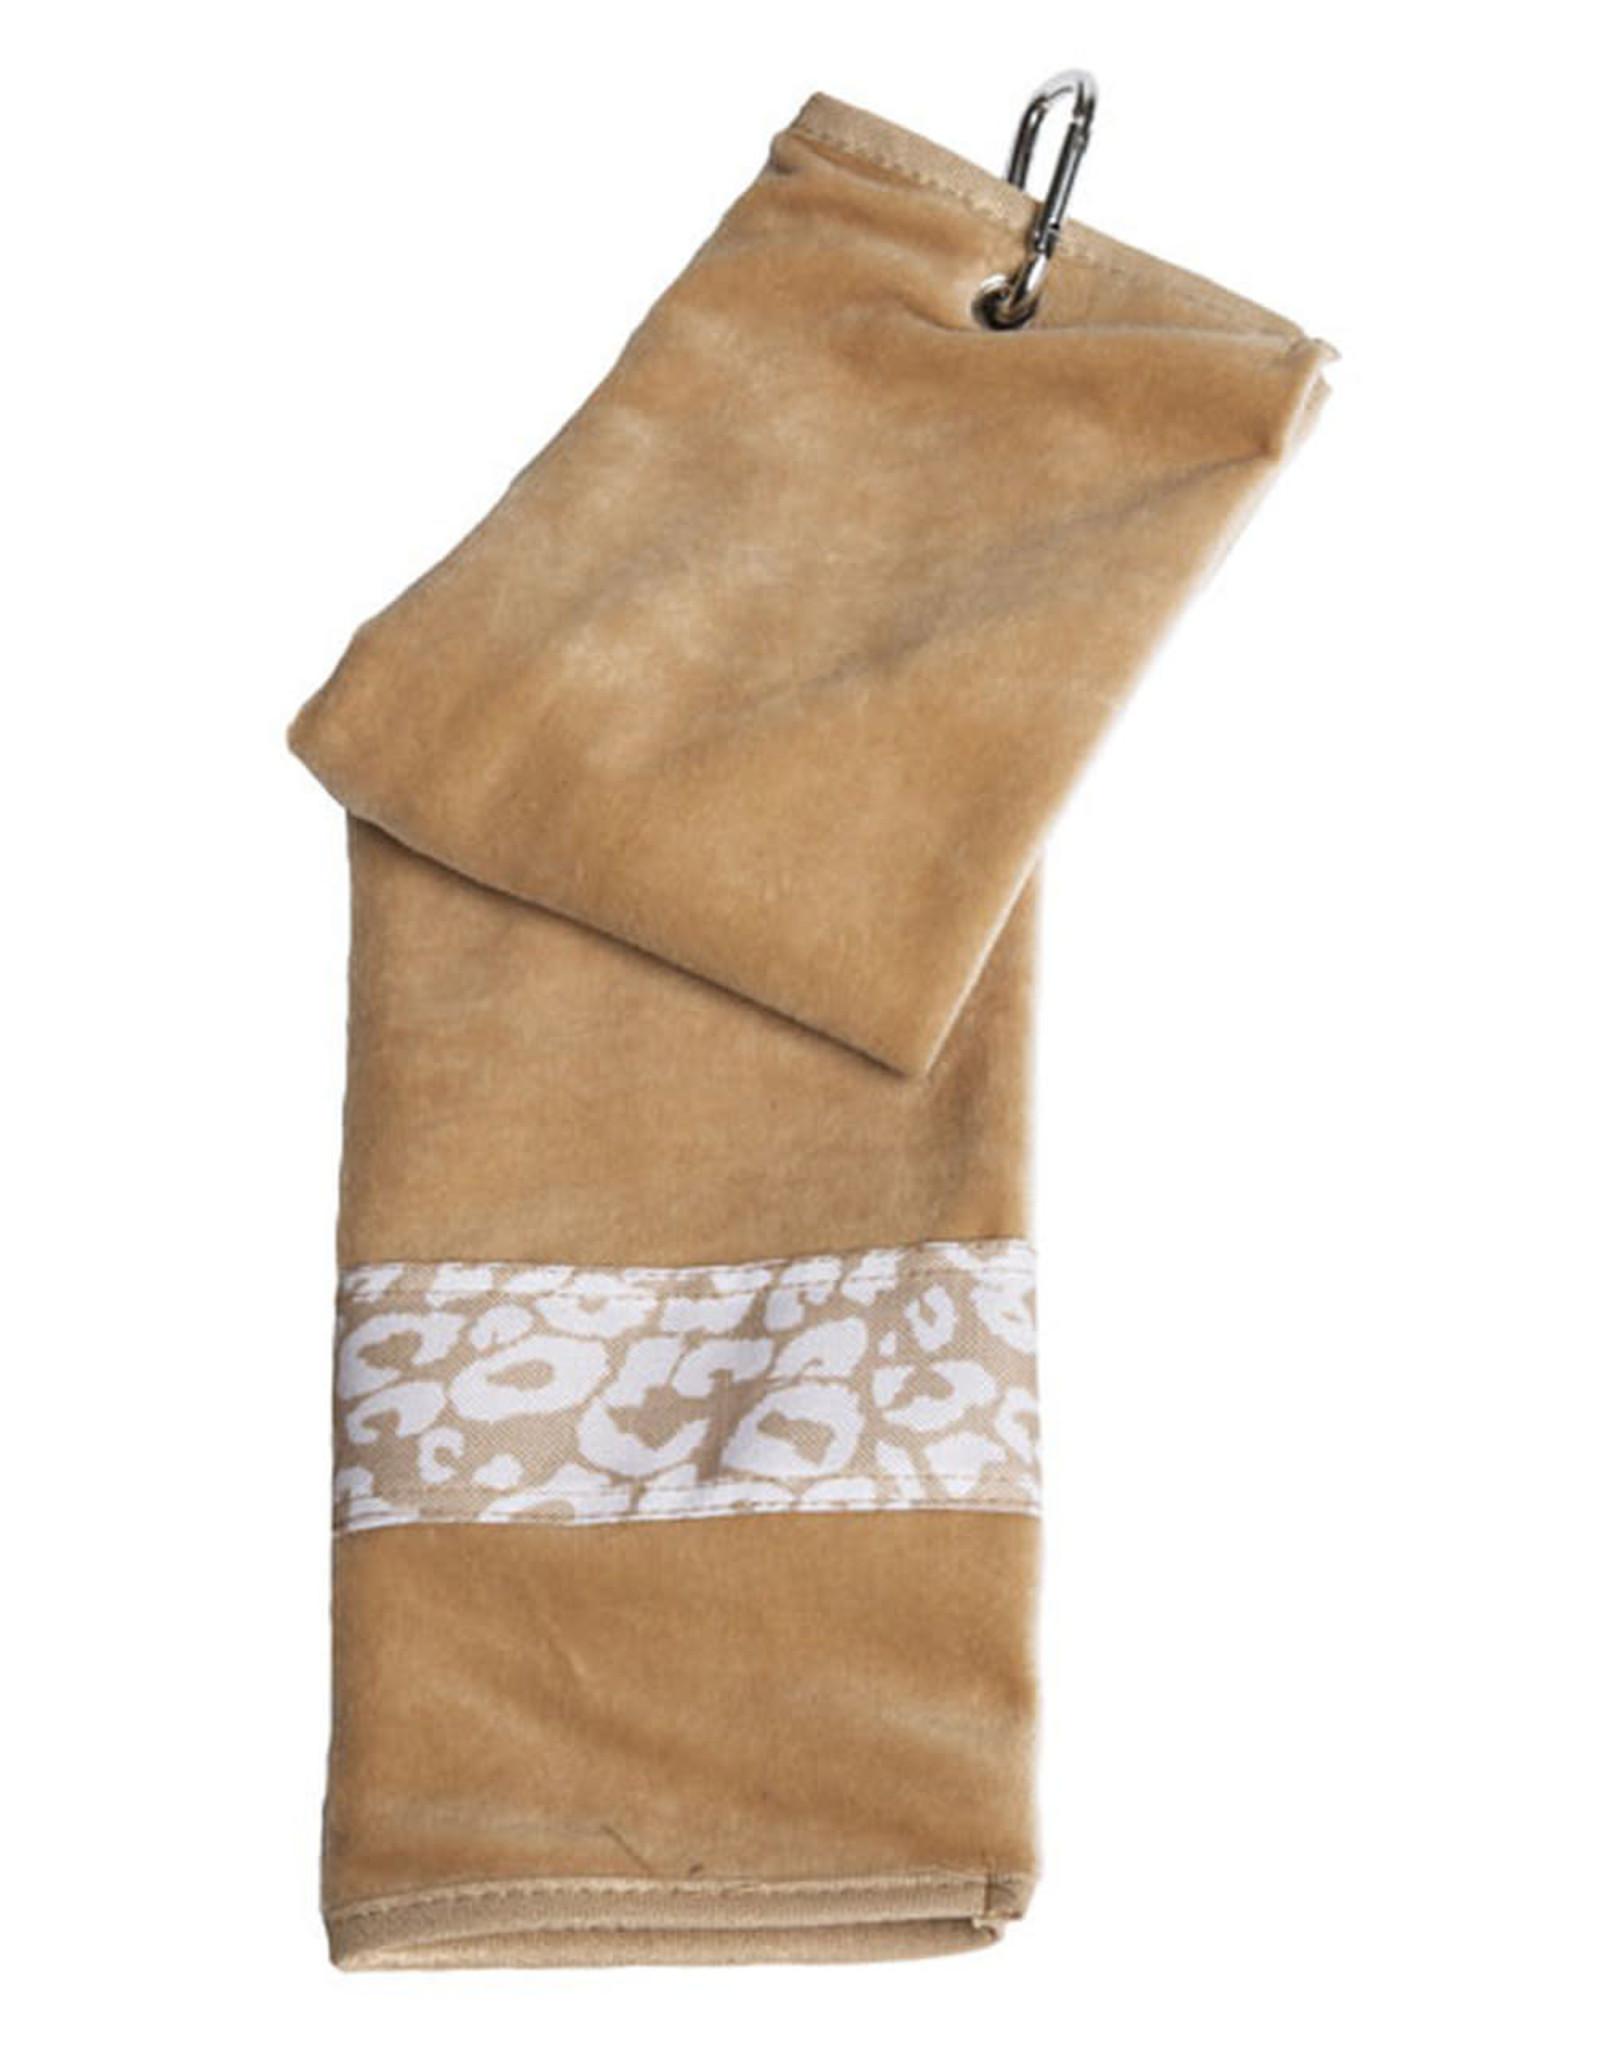 Glove It Uptown Cheetah Towel